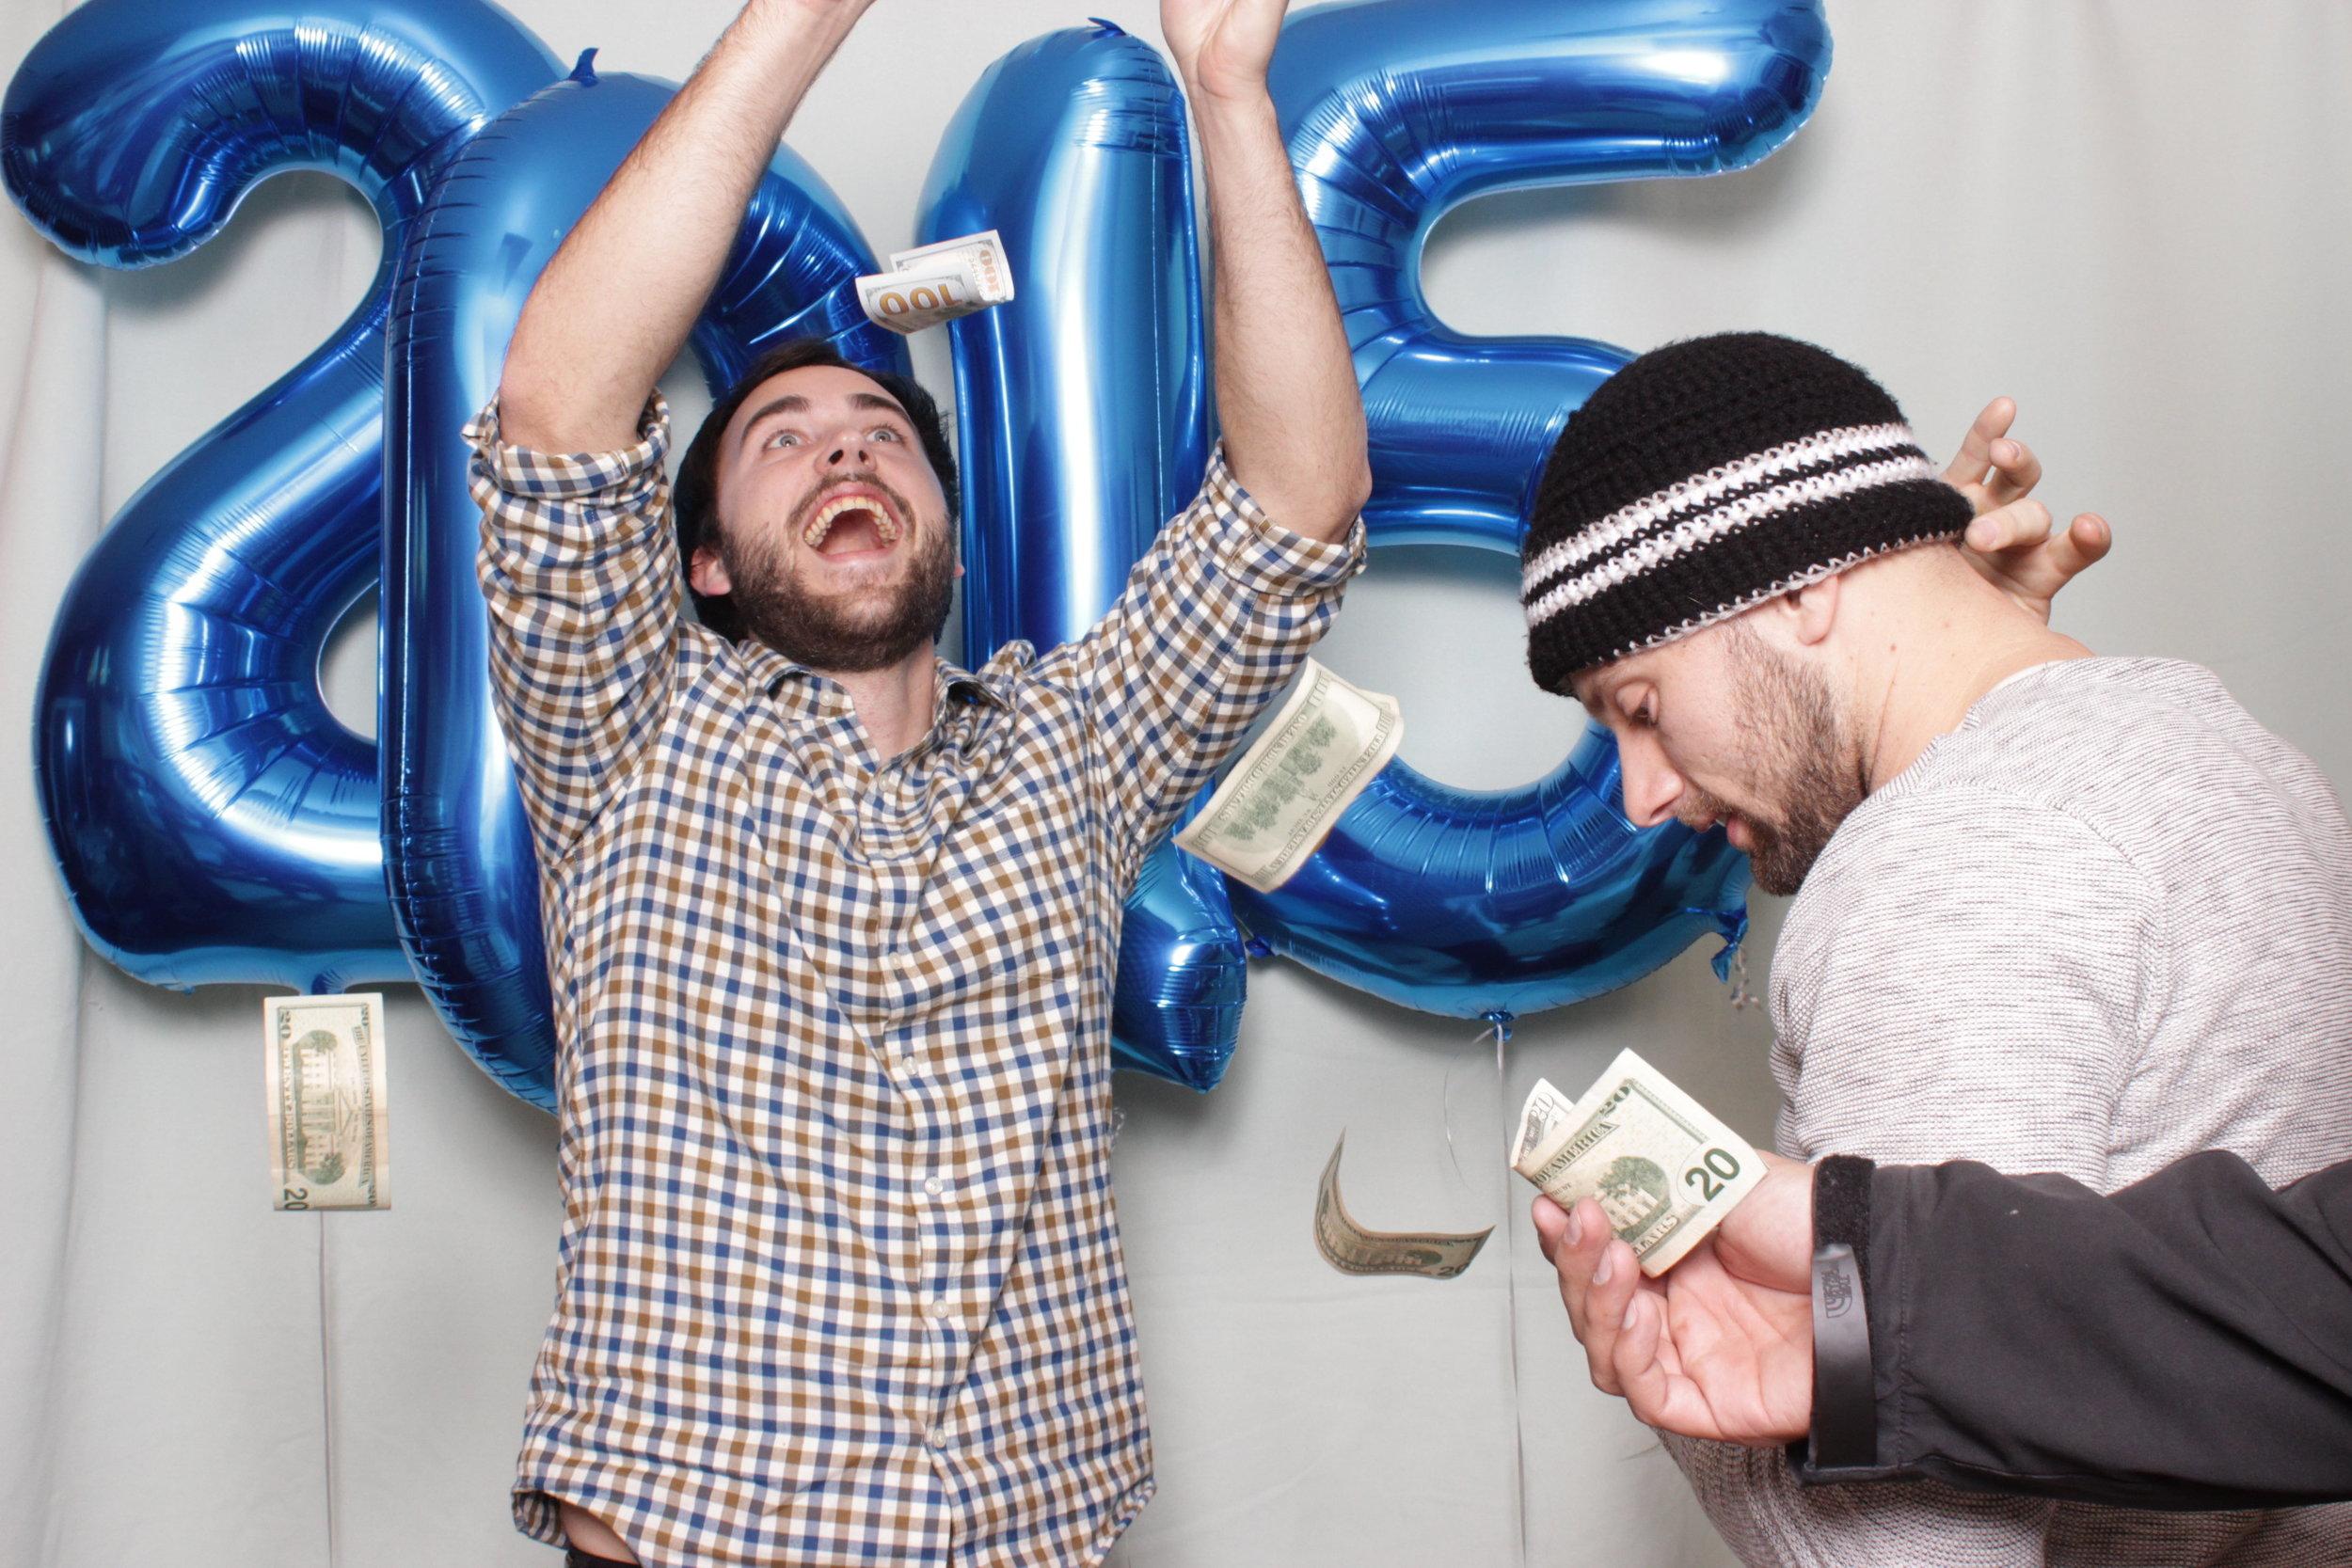 photo-booth-rental-in-chico-california-new-years-party-raining-money-make-it-rain